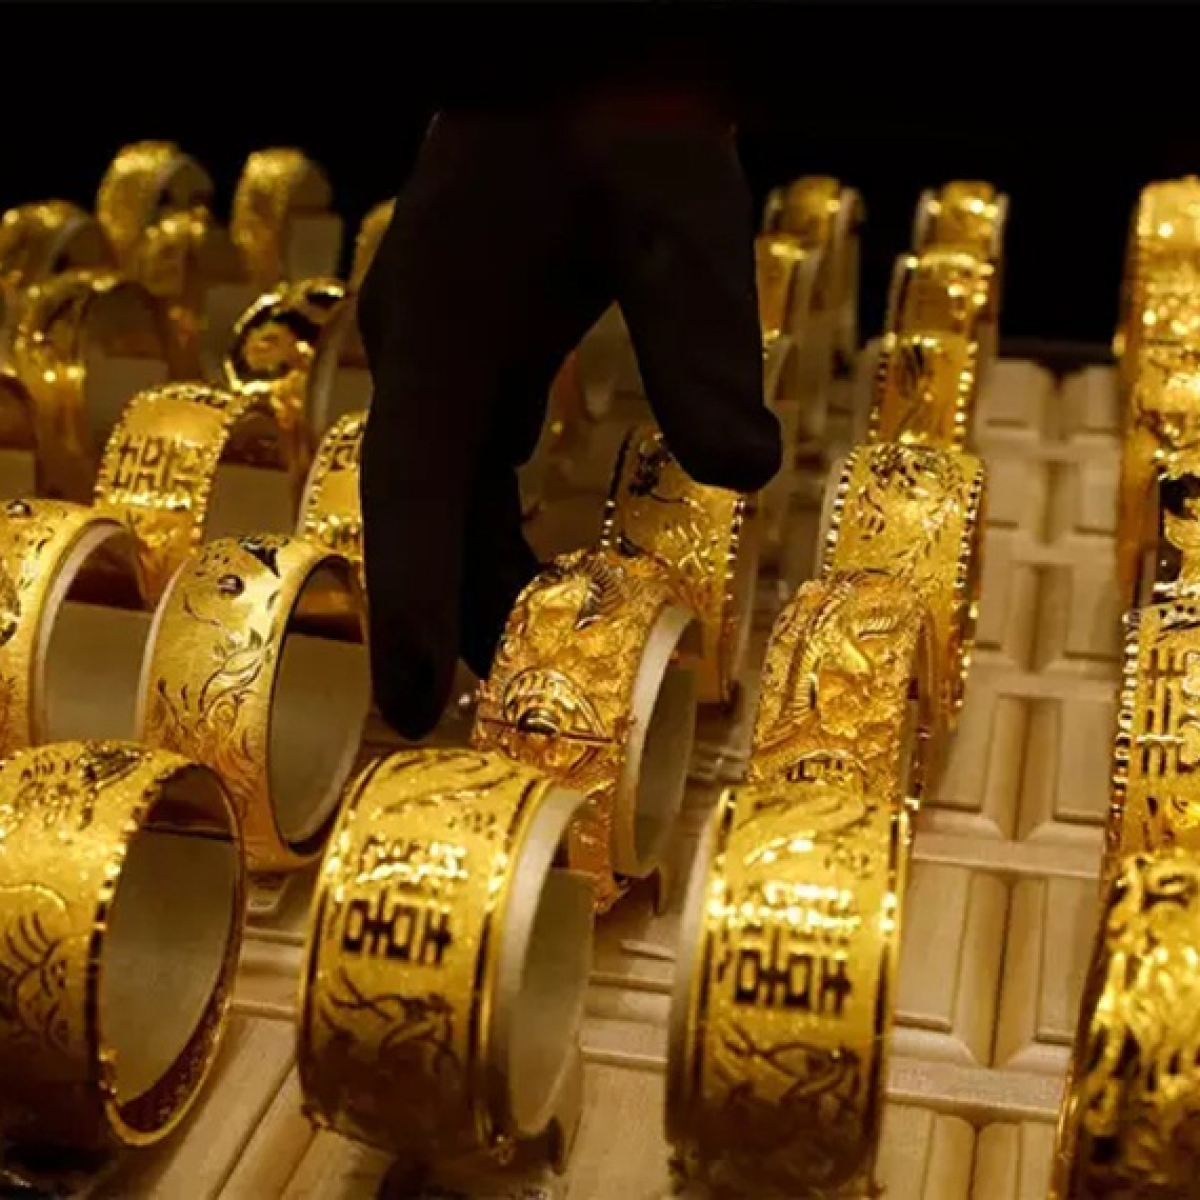 Gold Price Latest Update: Yellow metal price slips to Rs 47,496 per 10 gram